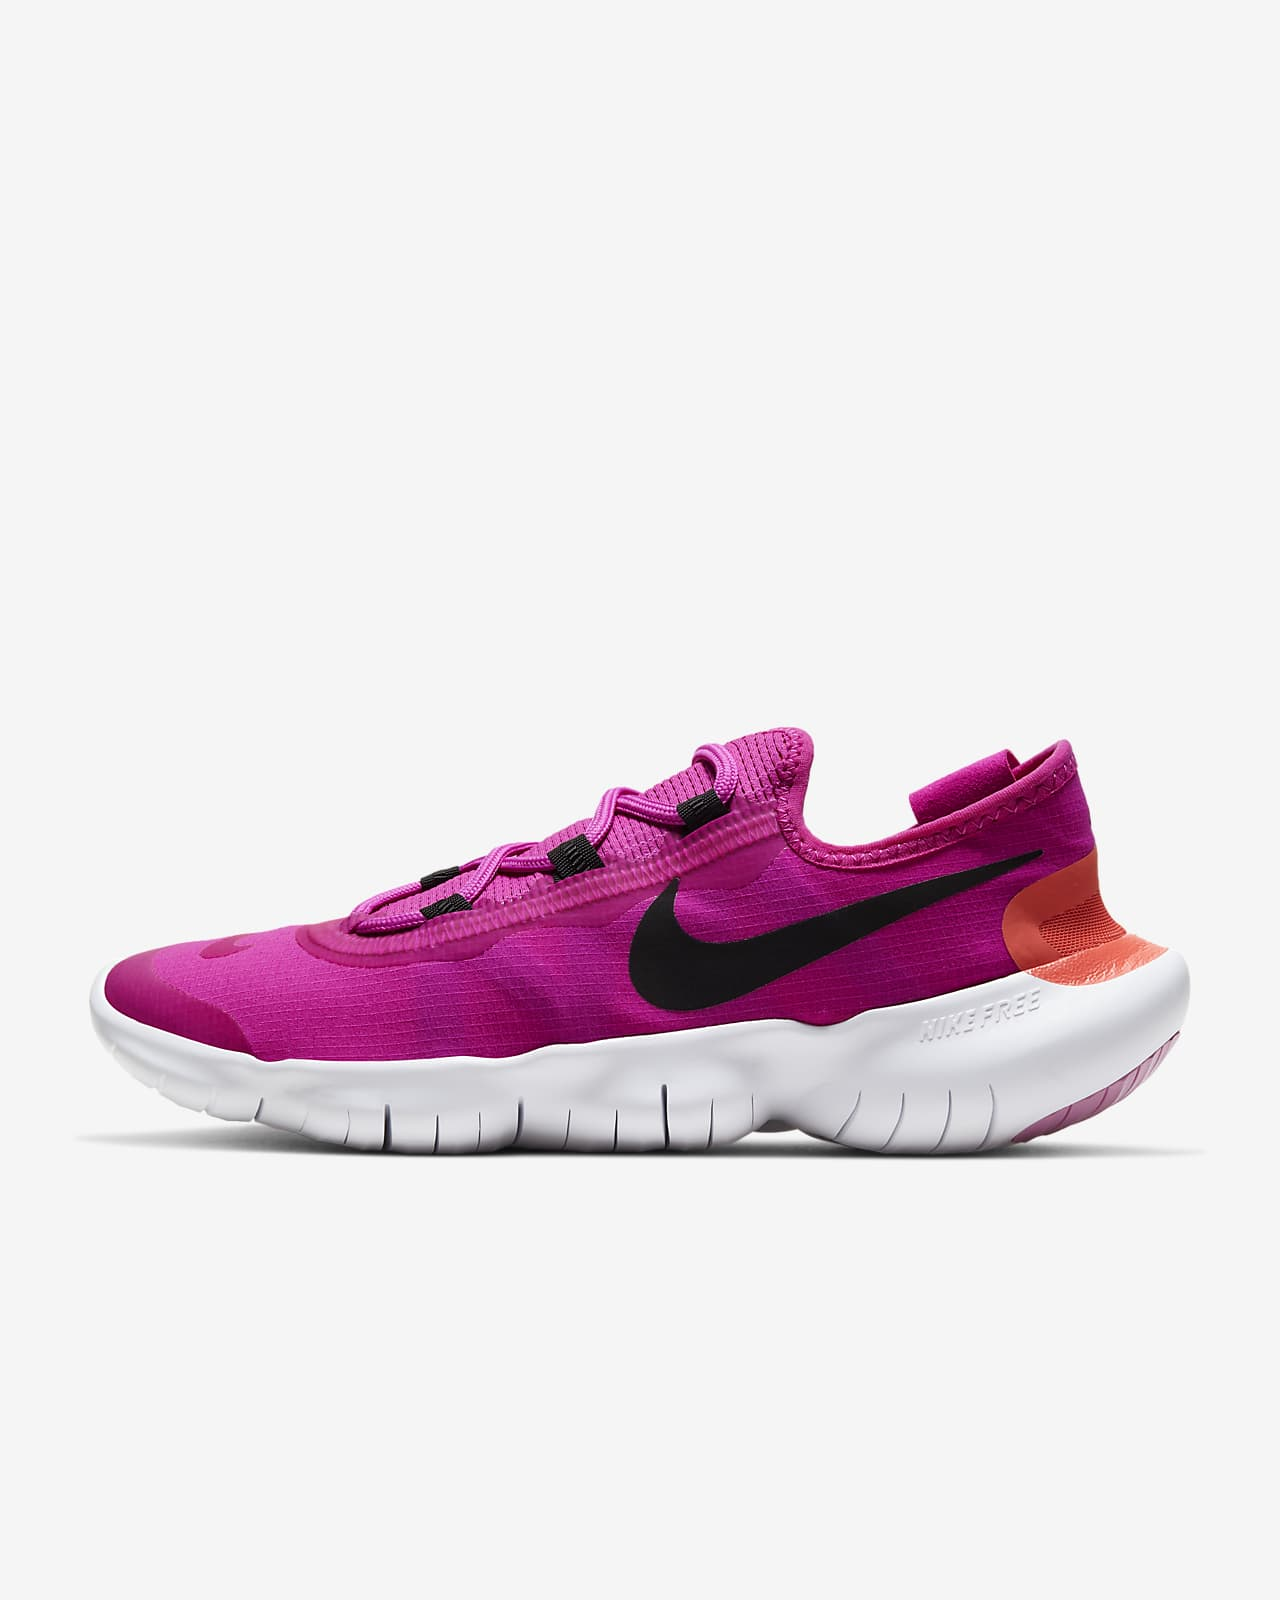 Muerto en el mundo acuerdo sangre  Calzado de running para mujer Nike Free RN 5.0. Nike MX